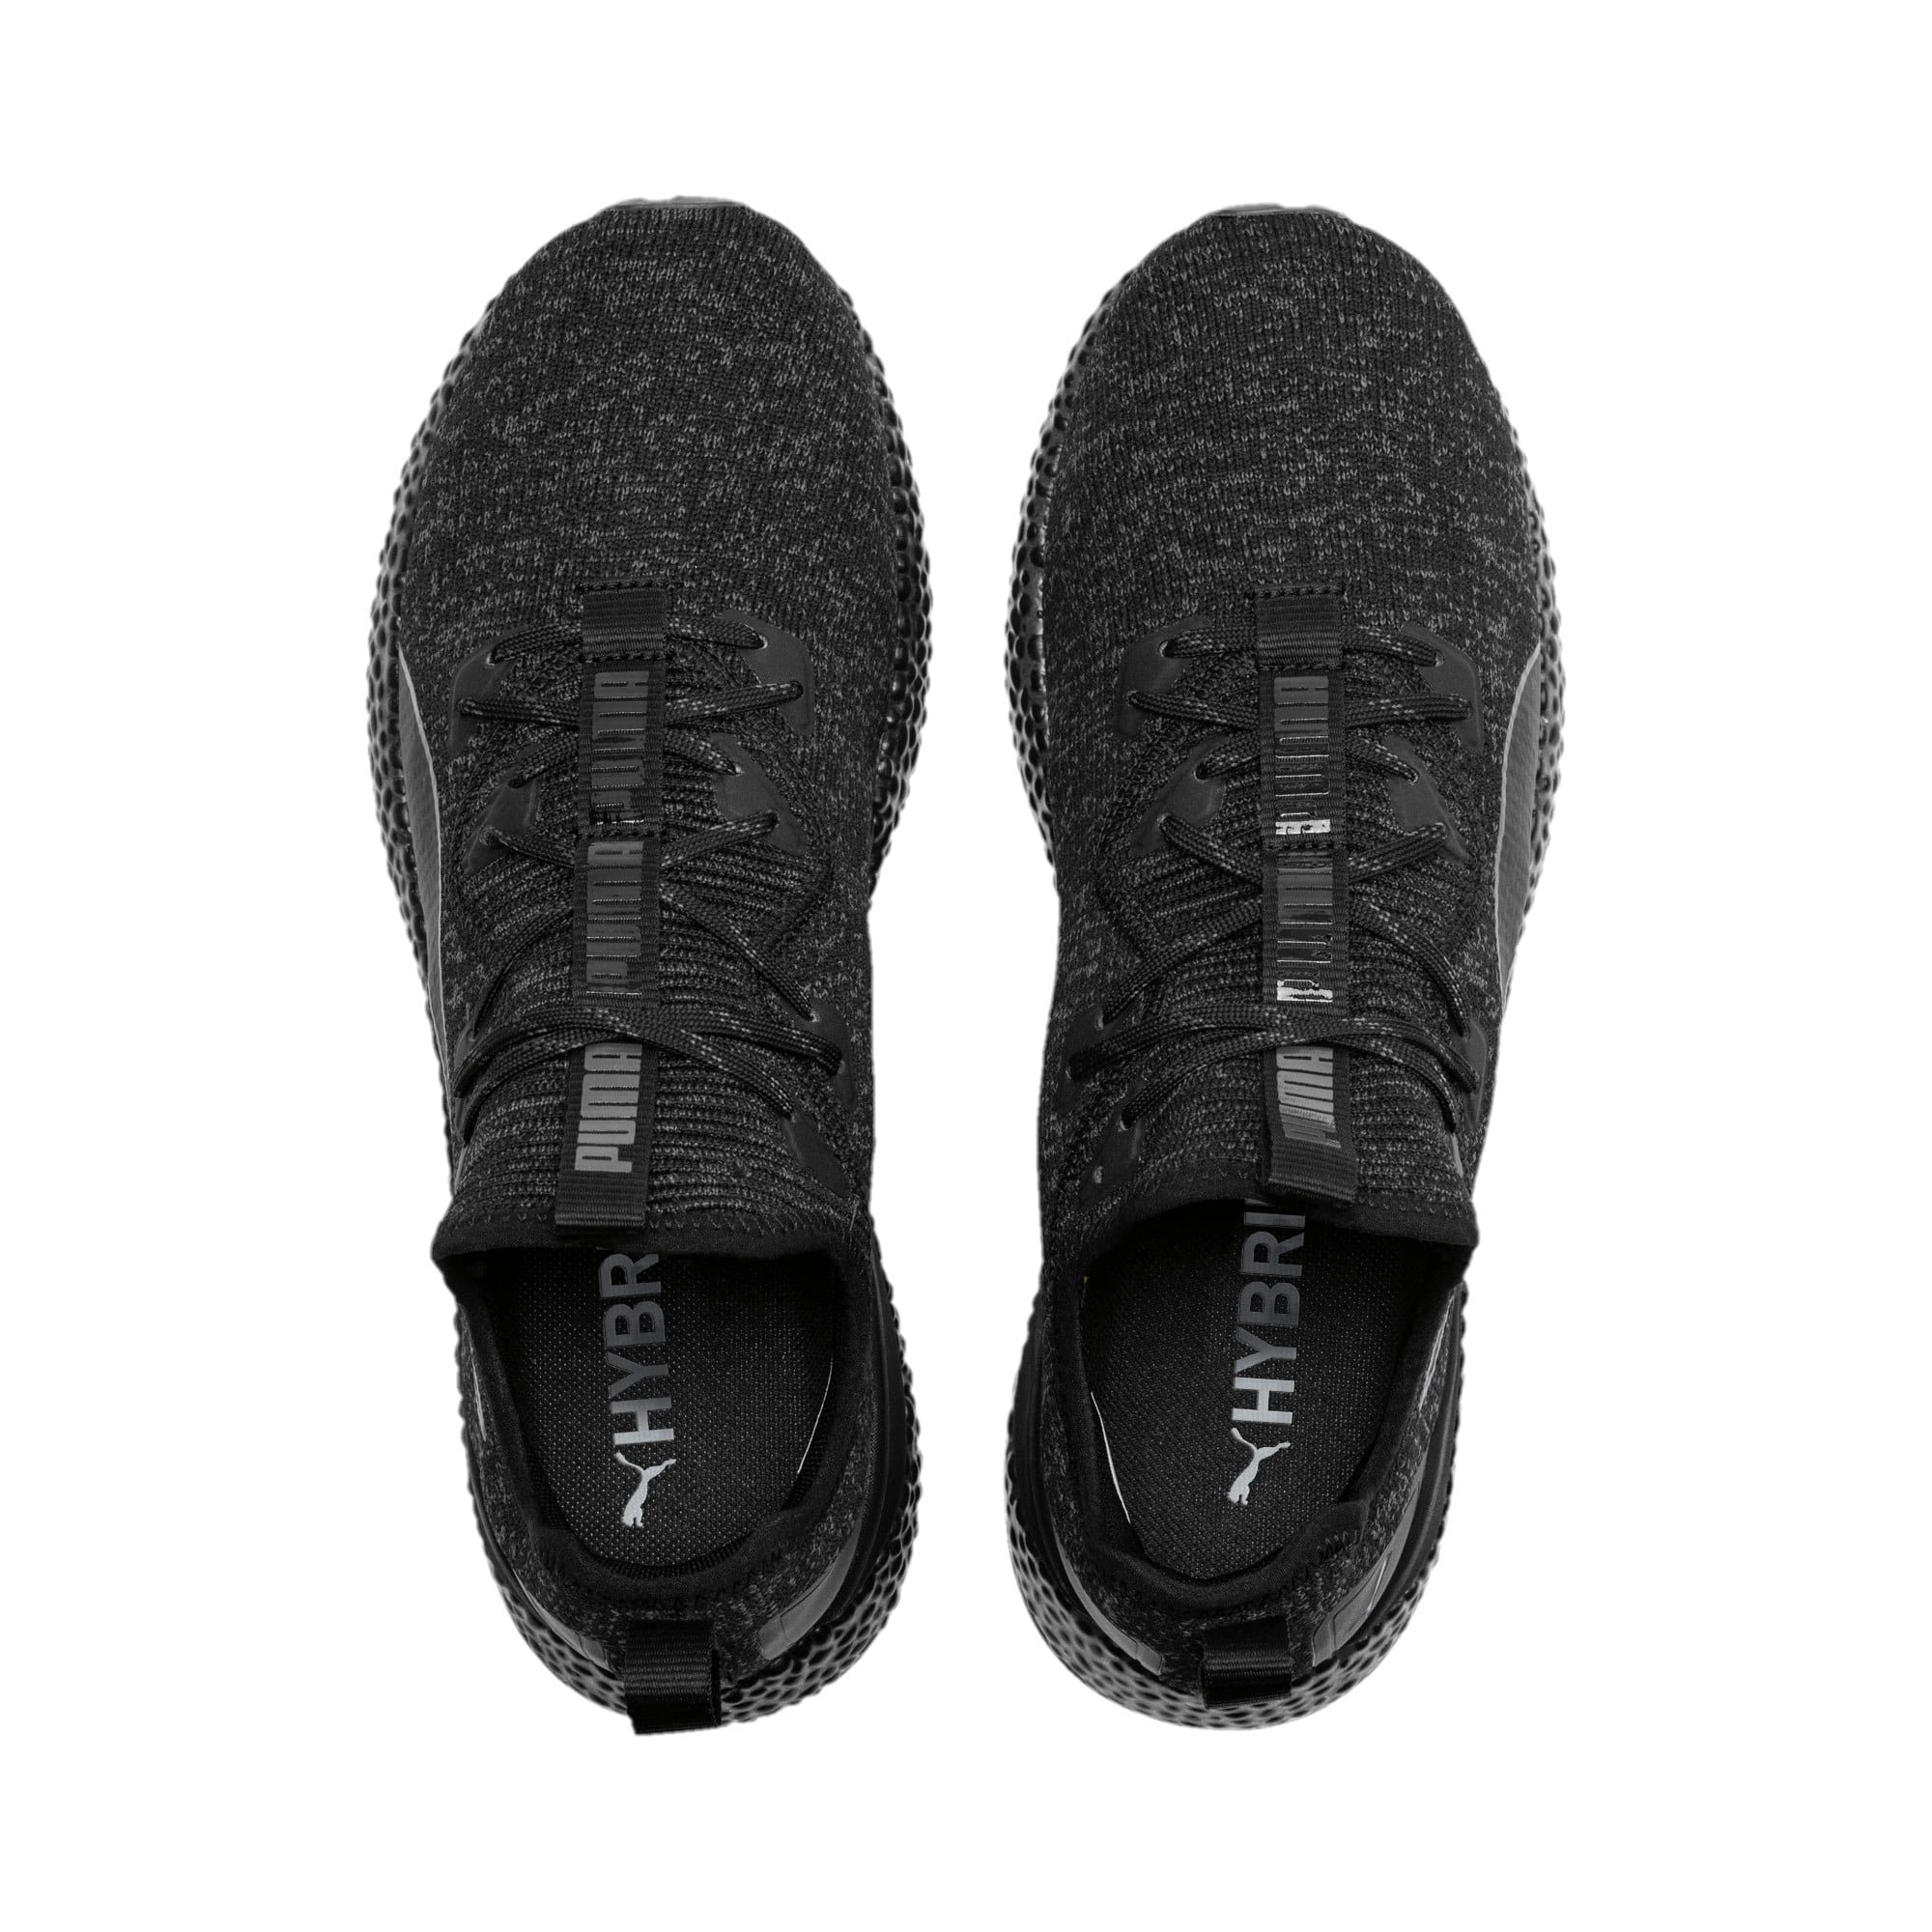 Thumbnail 7 of Hybrid Runner Men's Running Shoes, Asphalt-Puma Black, medium